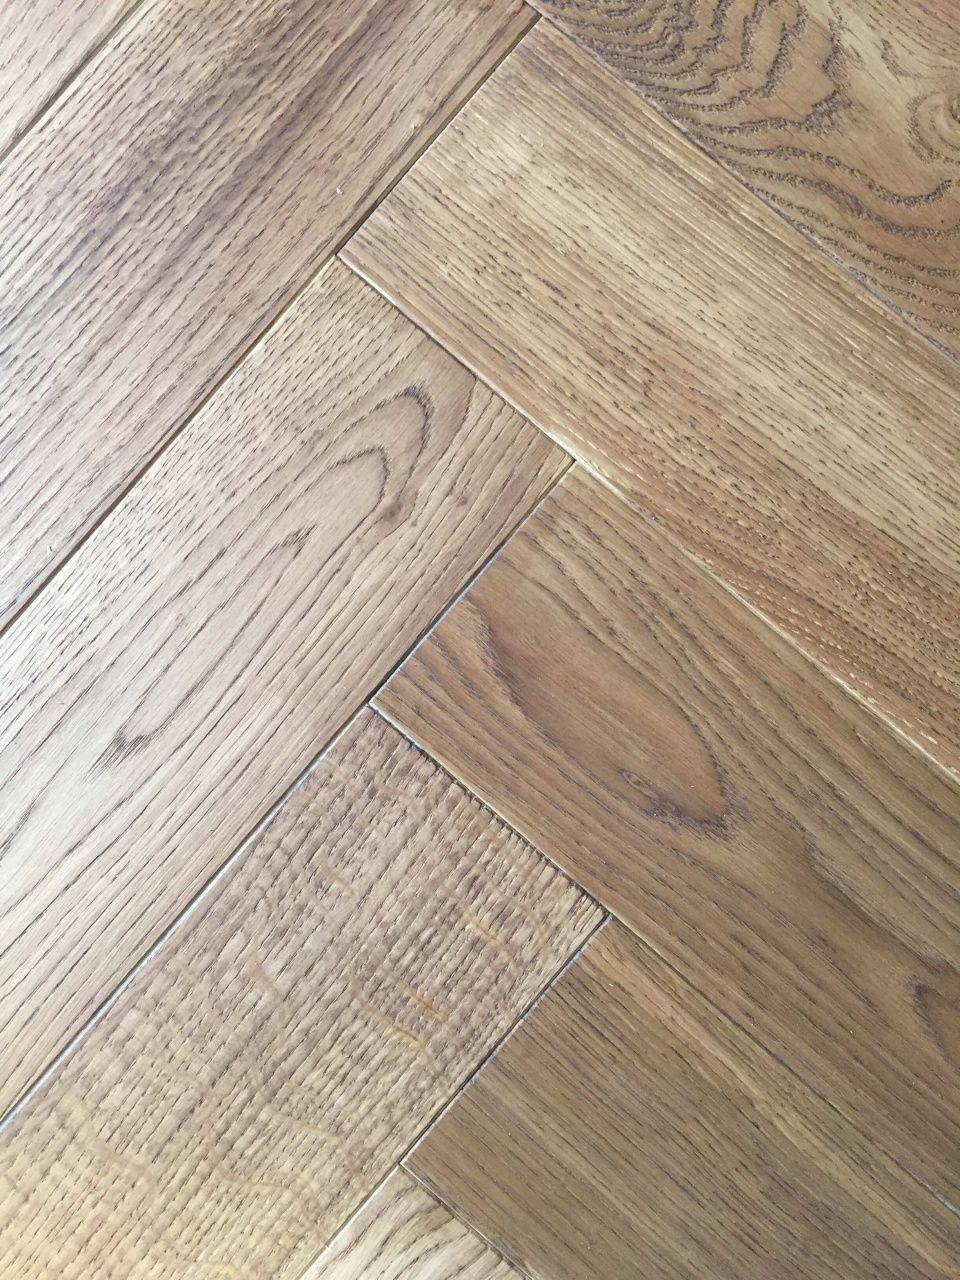 Kantenschutzprofil Woodtec Lt By Profilitecwoodtec Ltcoventry Oak Laminate Flooringc In 2020 Engineered Wood Floors Wood Laminate Flooring Engineered Hardwood Flooring